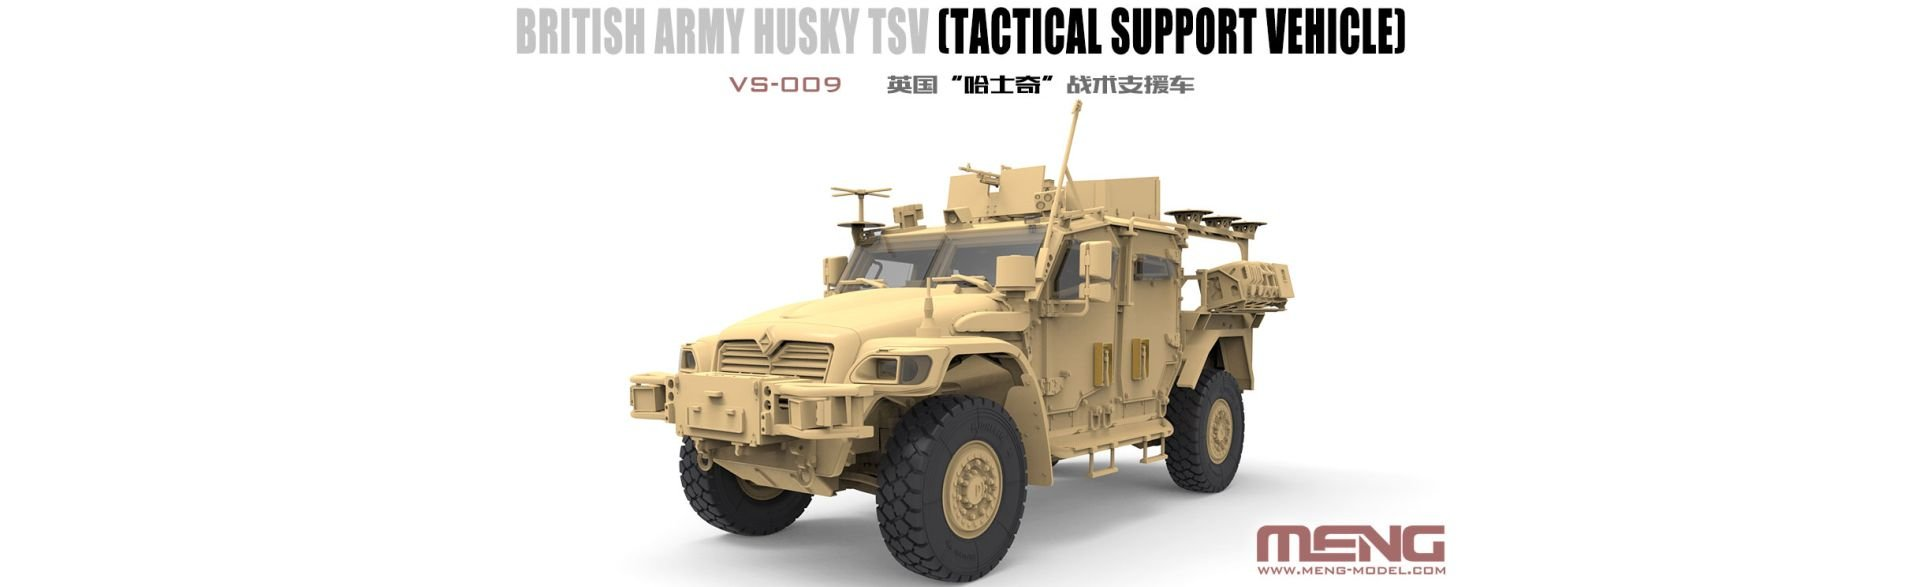 British Army Husky TSV